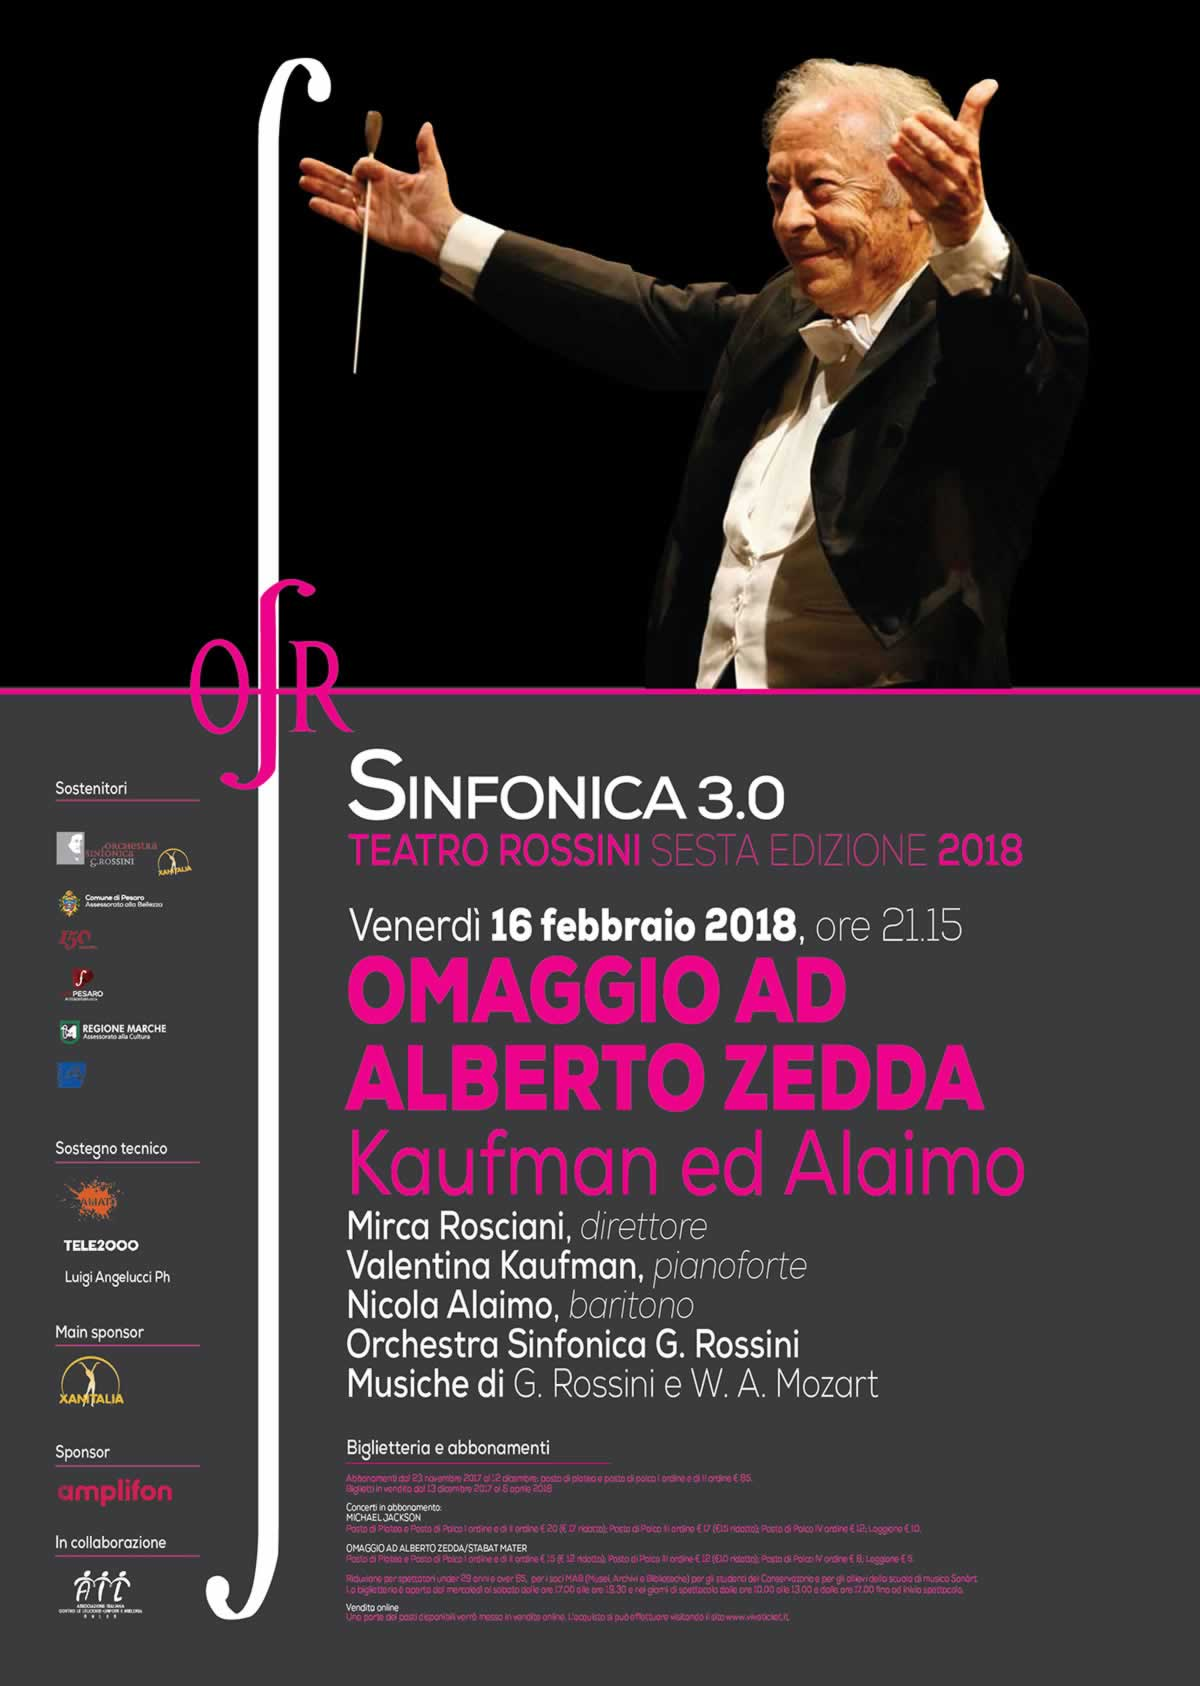 Concerto-alberto-zedda-teatro-rossini-2018-osr-main